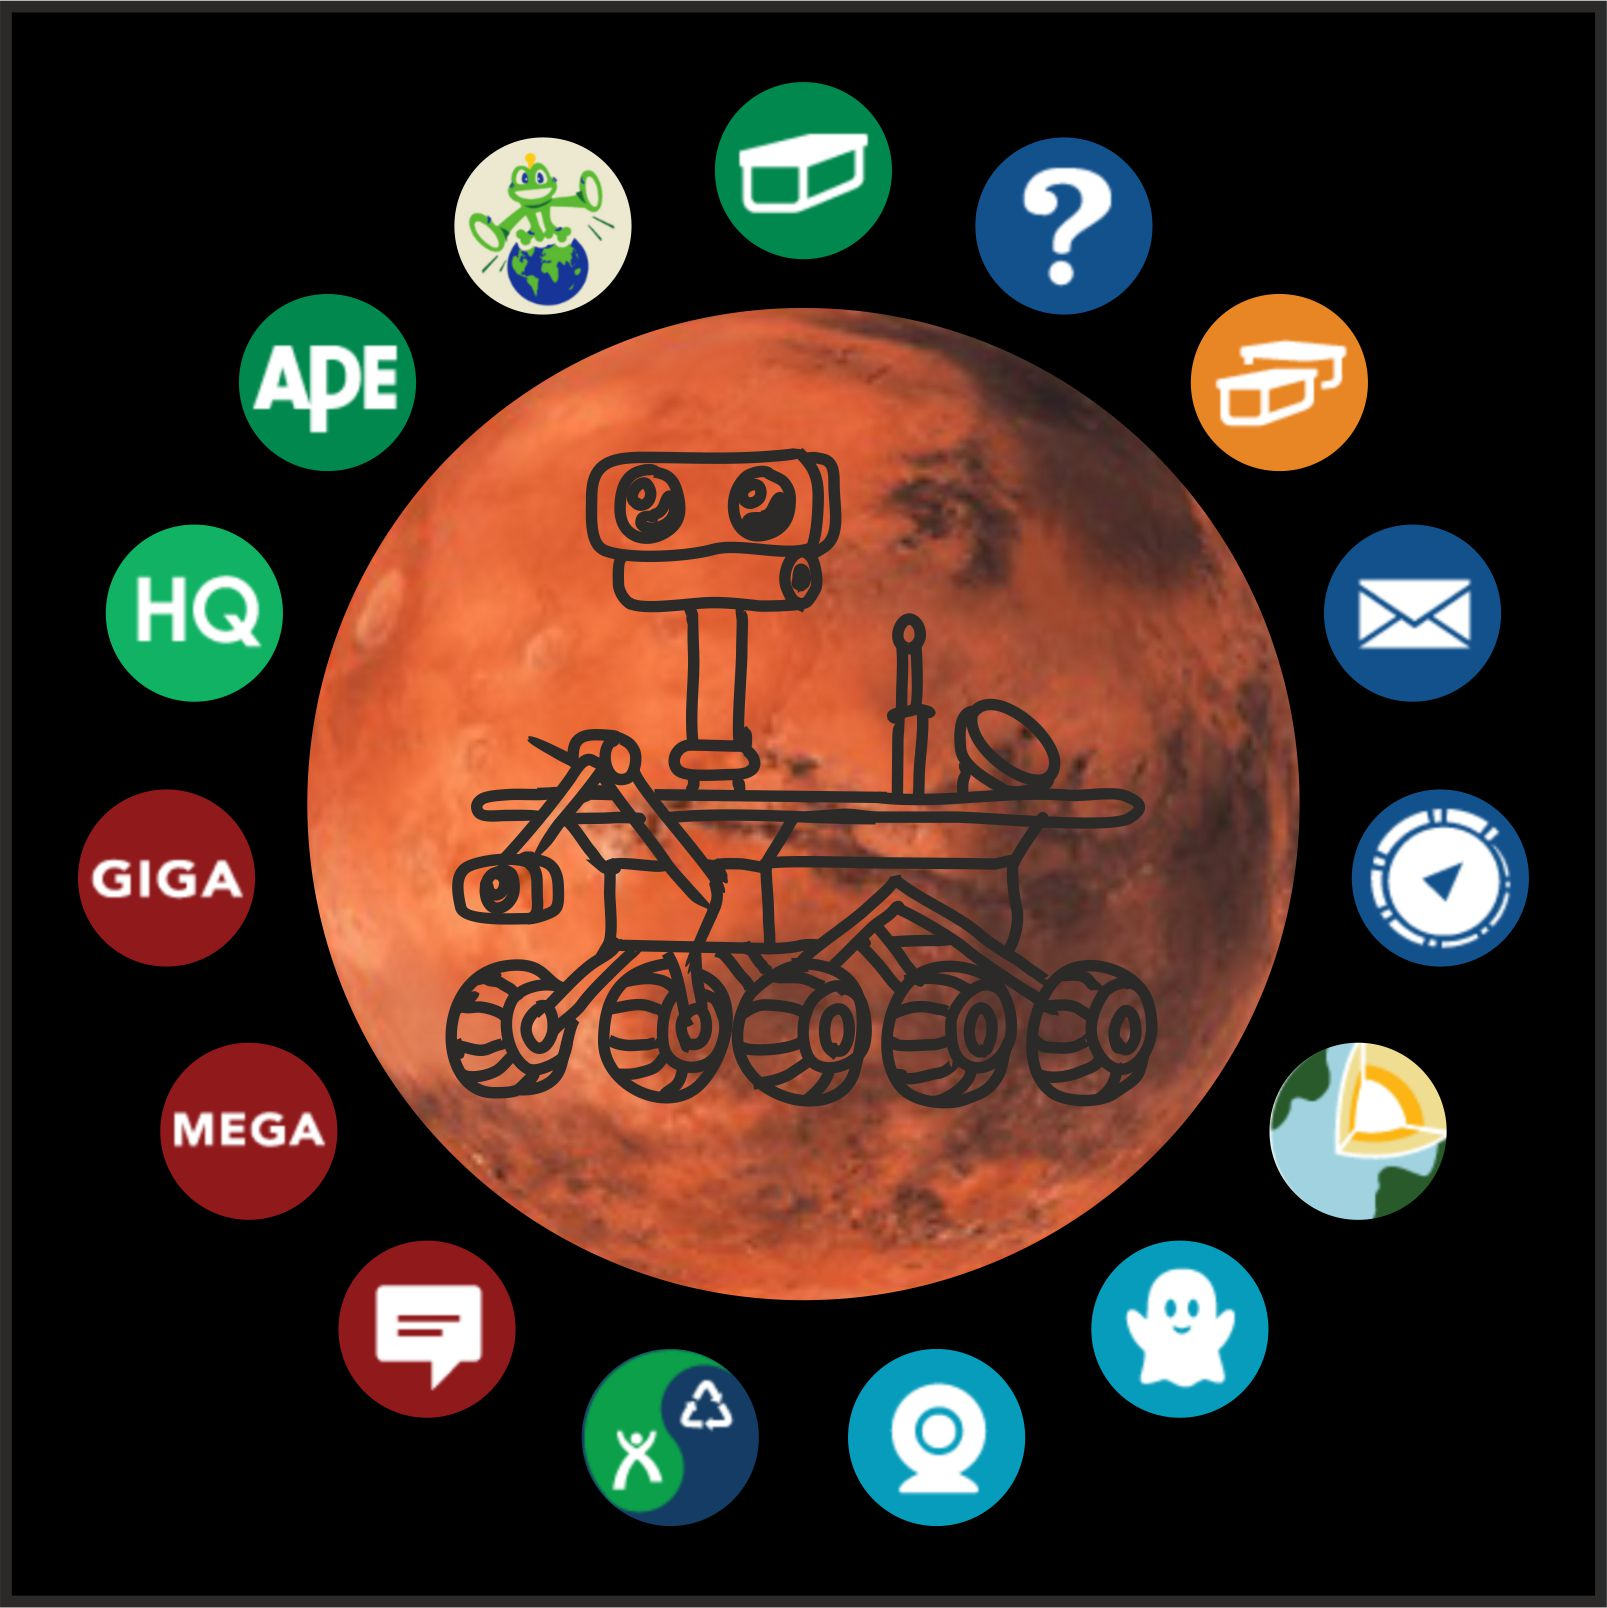 Tébéčko na Marsu